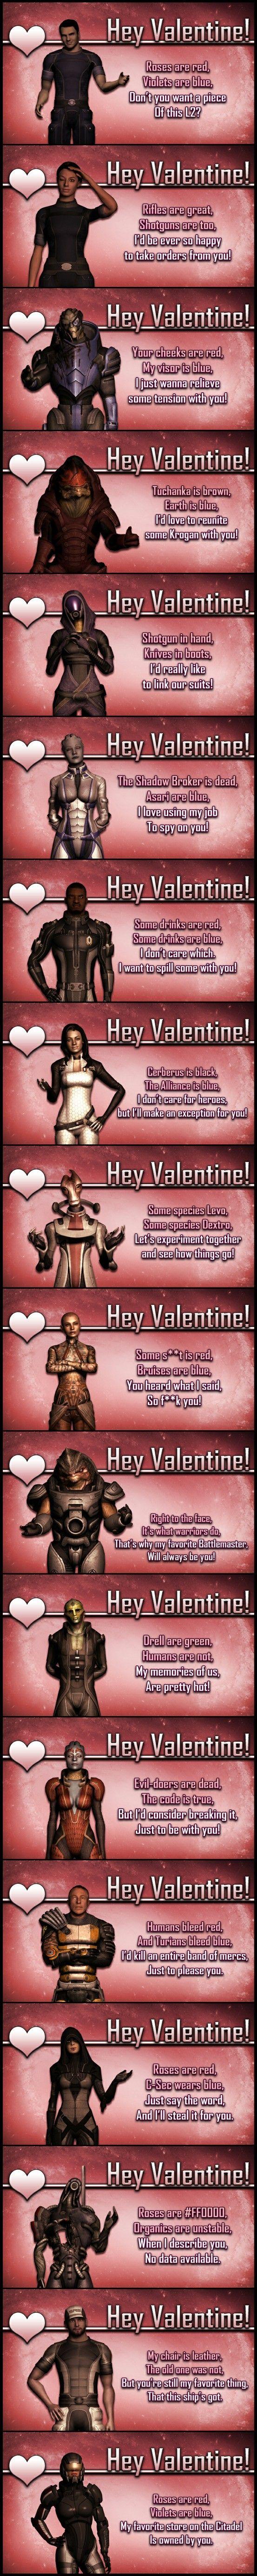 Mass Effect Valentines: JAck, Joker and Mordin fuckin got me and omfg little legion bby...